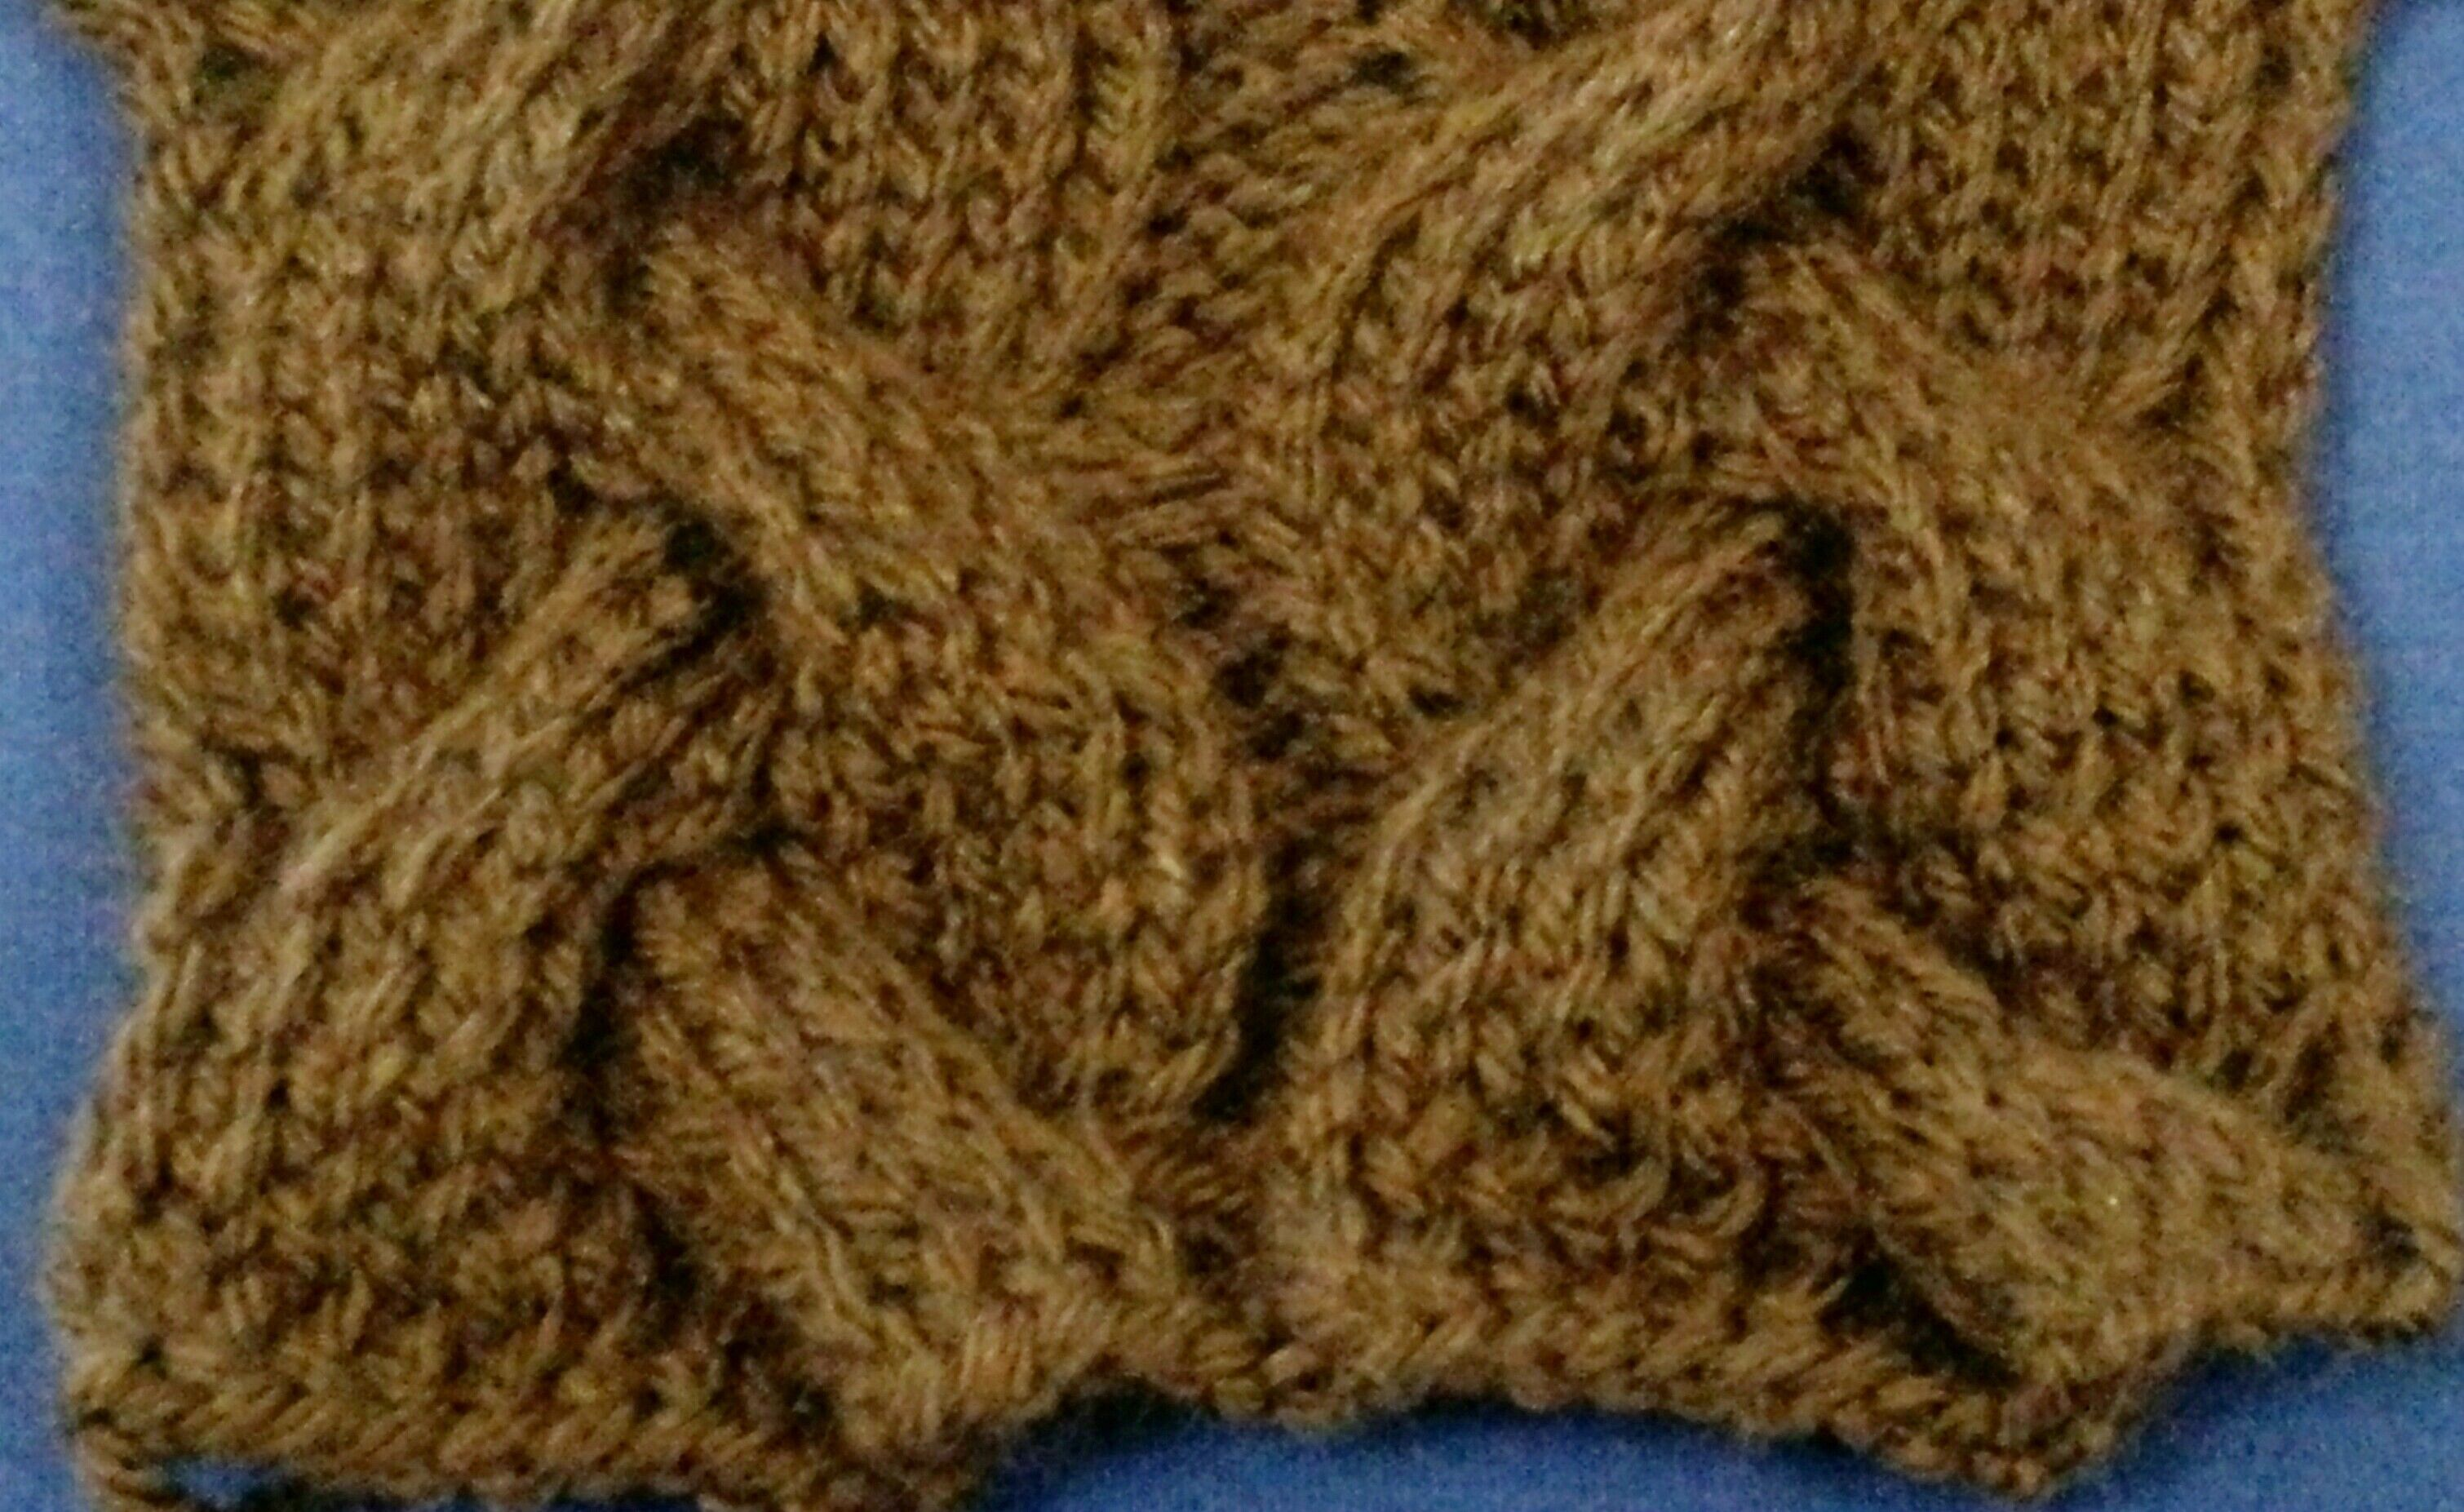 Plaited Cable Stitch | Crochet & Knitting | Pinterest | Plaits ...